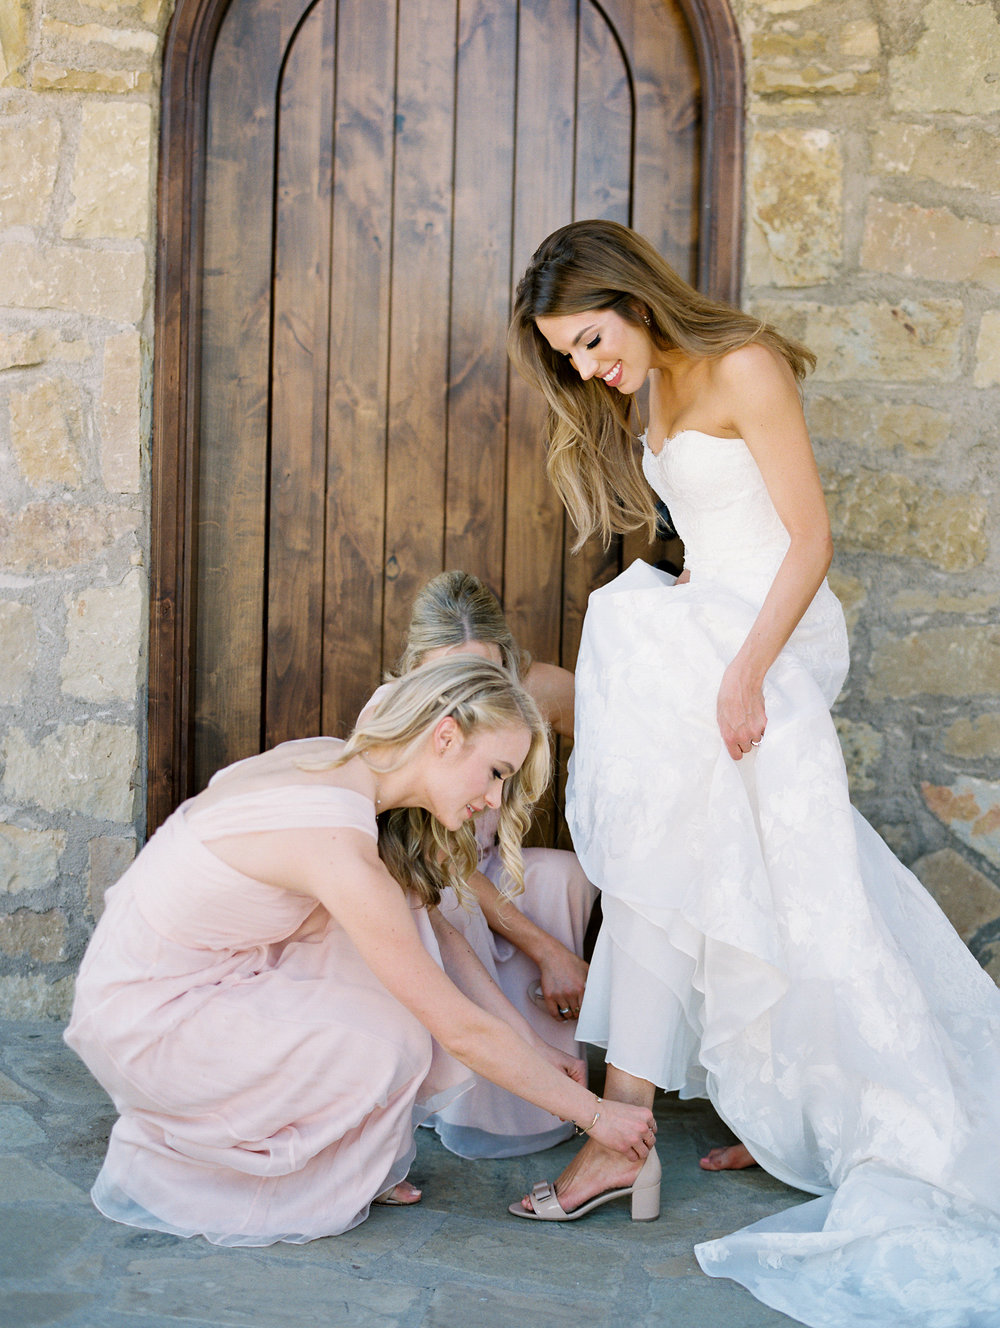 Escondido-Golf_Lake-Club-Hill-Country-Houston-Wedding-Photographer-Best-Top-Luxury-Destination-Engagements-Portrait-Austin-Photography-5.jpg